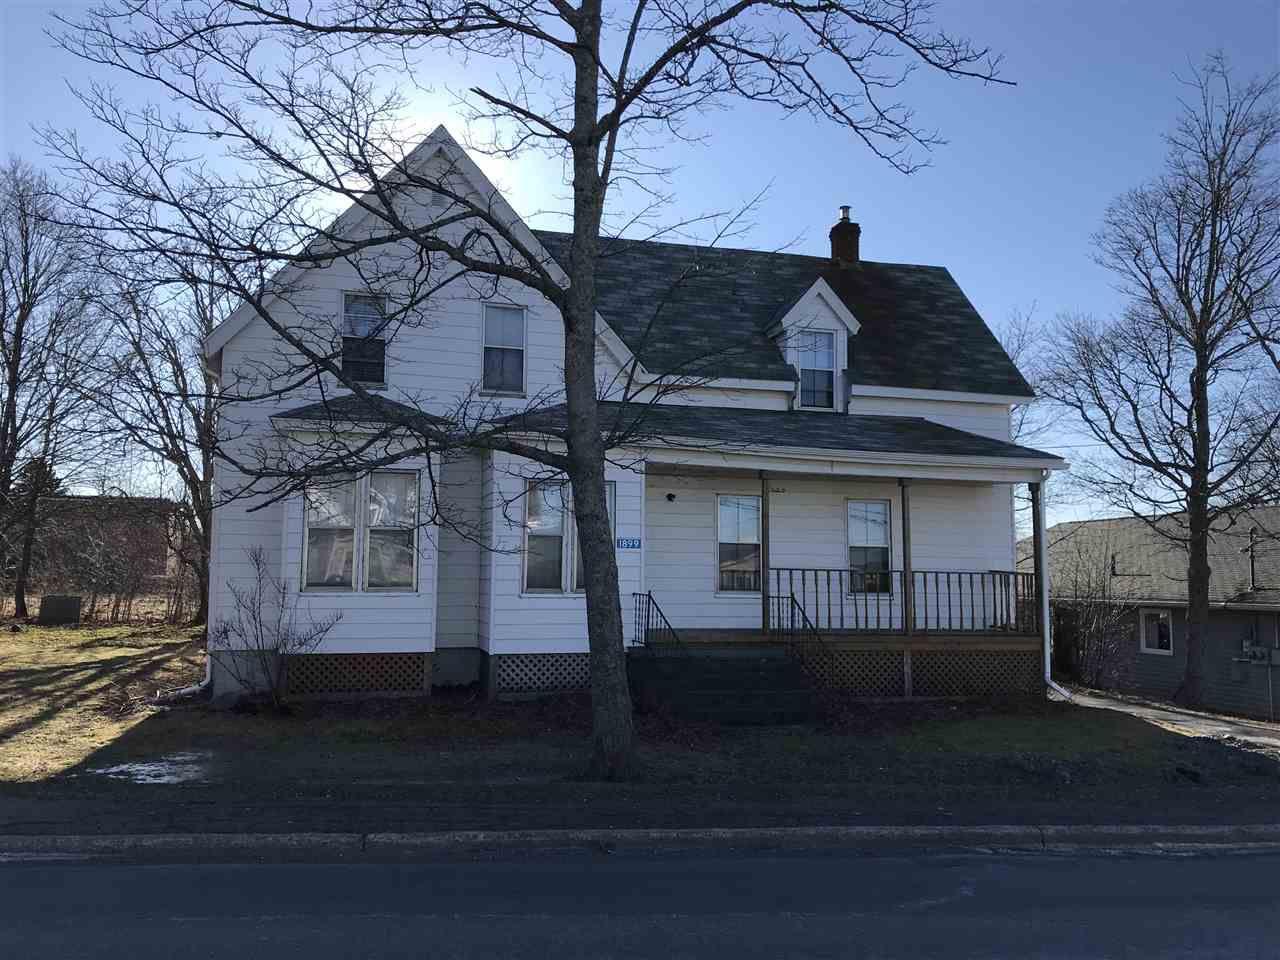 Main Photo: 1899 Drummond Road in Westville: 107-Trenton,Westville,Pictou Residential for sale (Northern Region)  : MLS®# 201902609